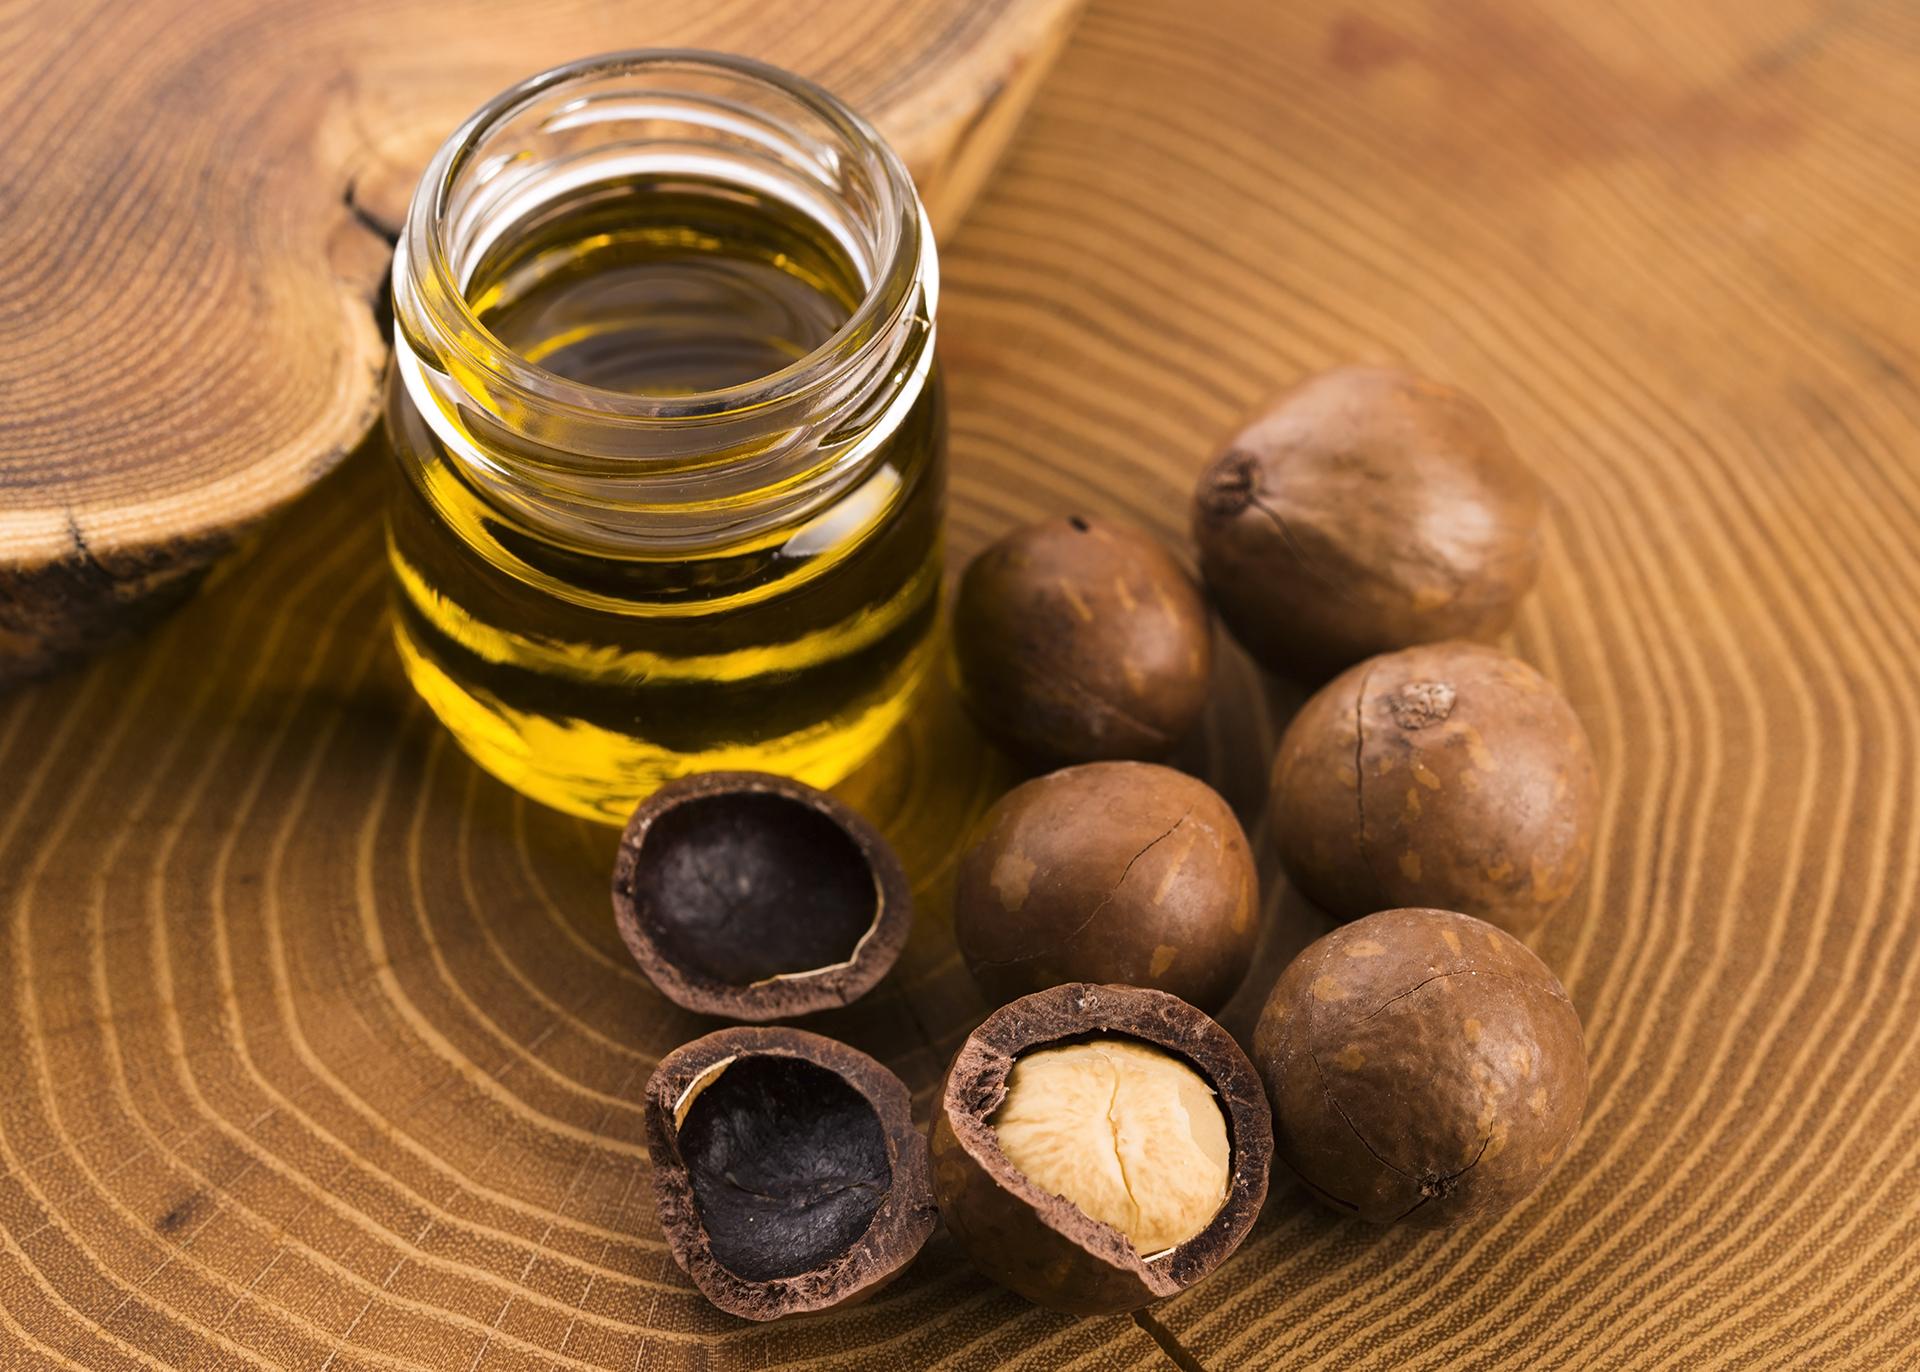 Macadamianut-Oil_Henry-Lamotte-Oils